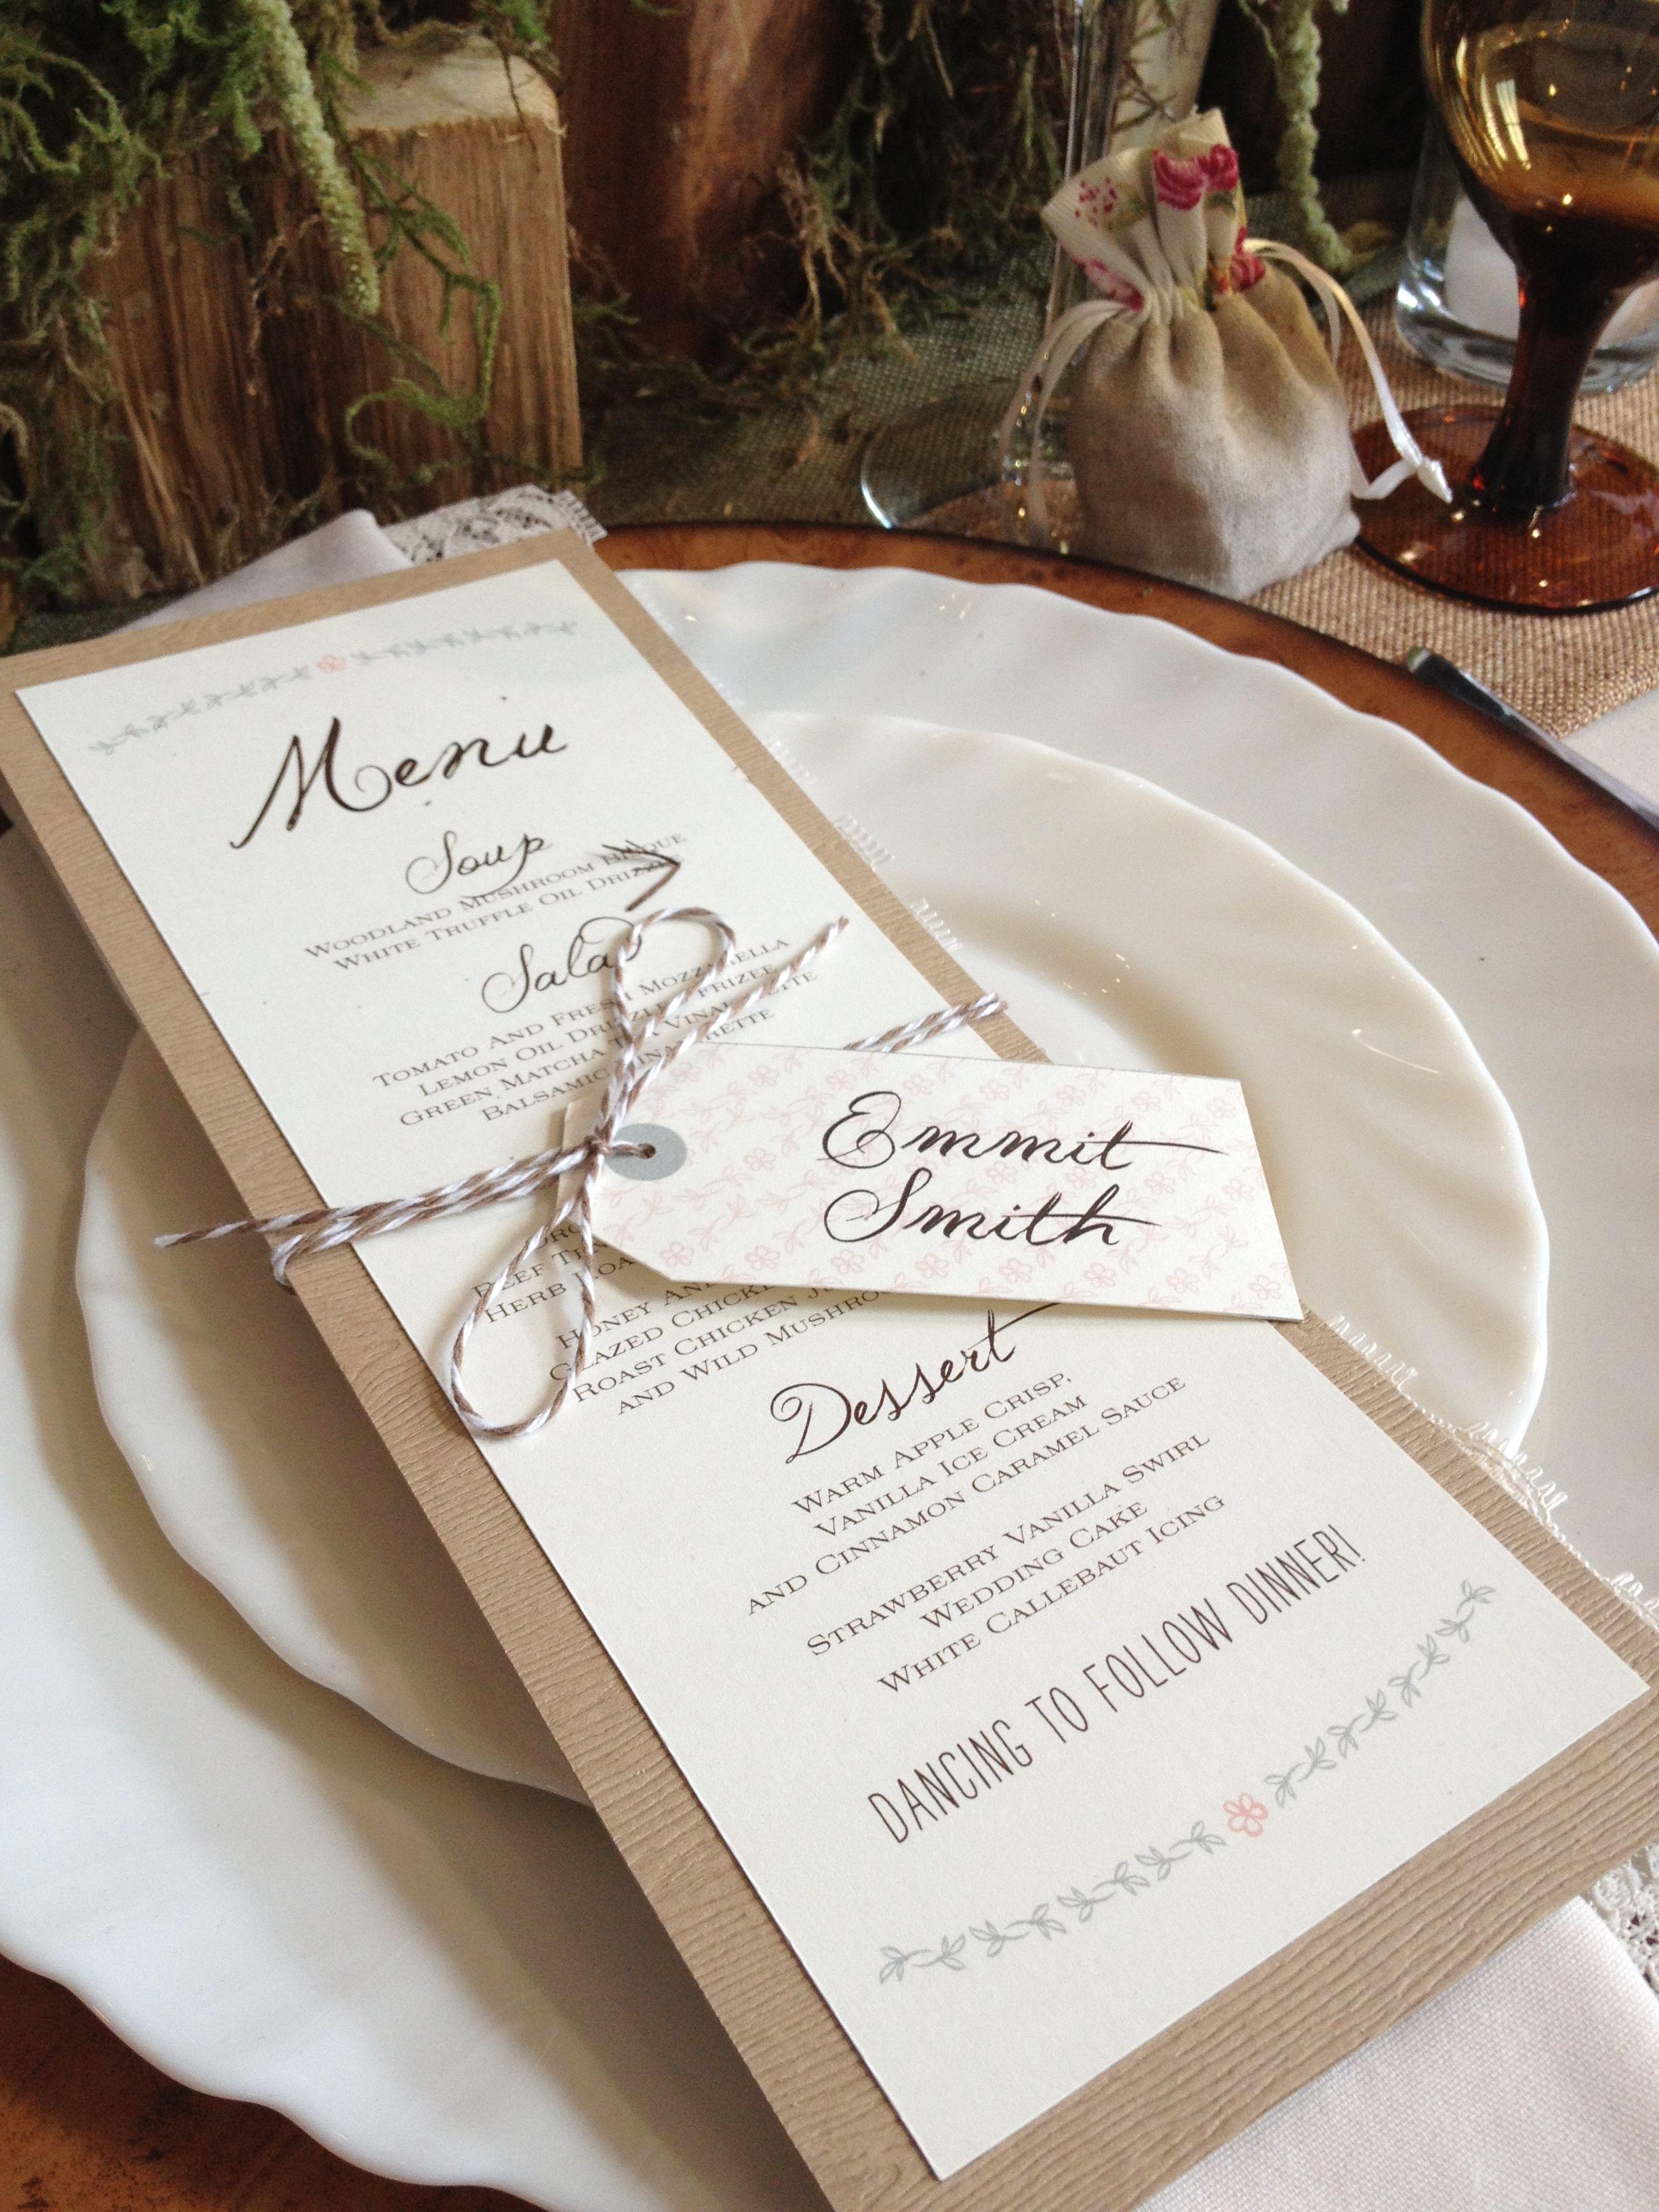 60 ideas of wedding menu design, copy this | wedding decorations